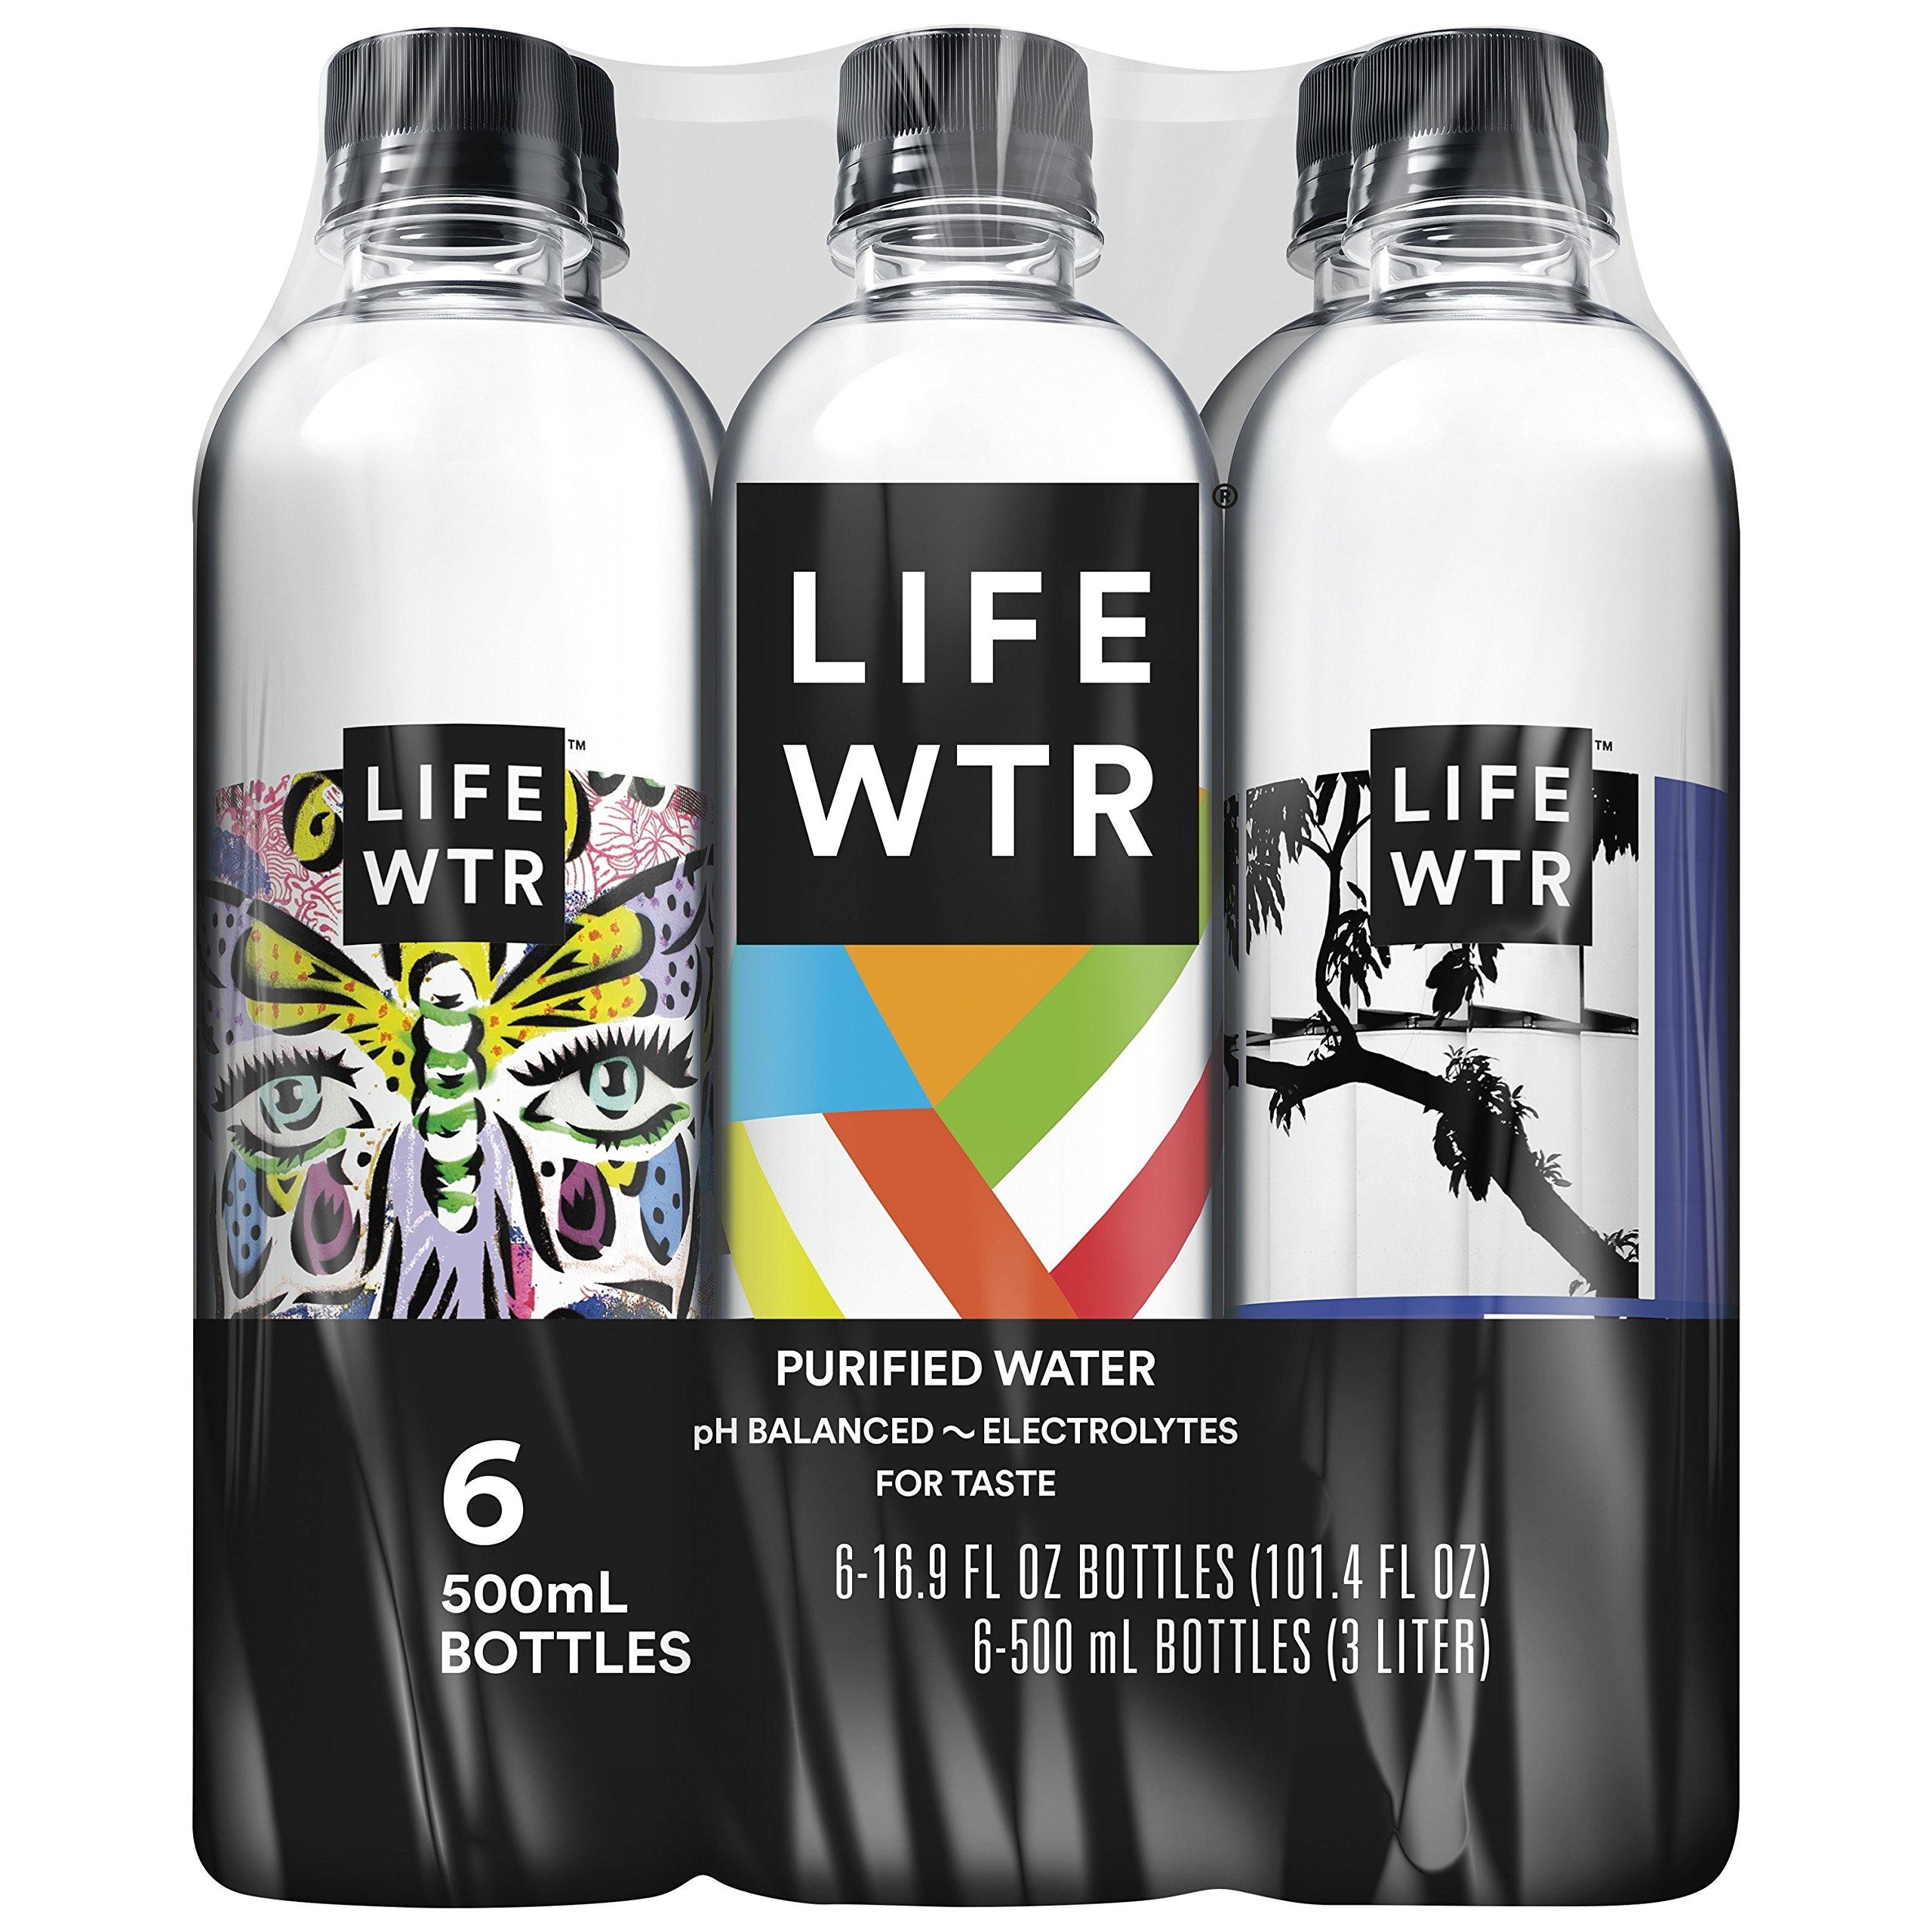 LIFEWTR, Premium Purified Water, pH Balanced with Electrolytes For Taste, 16.9 Fl Oz (6 Bottles) (Packaging May Vary)